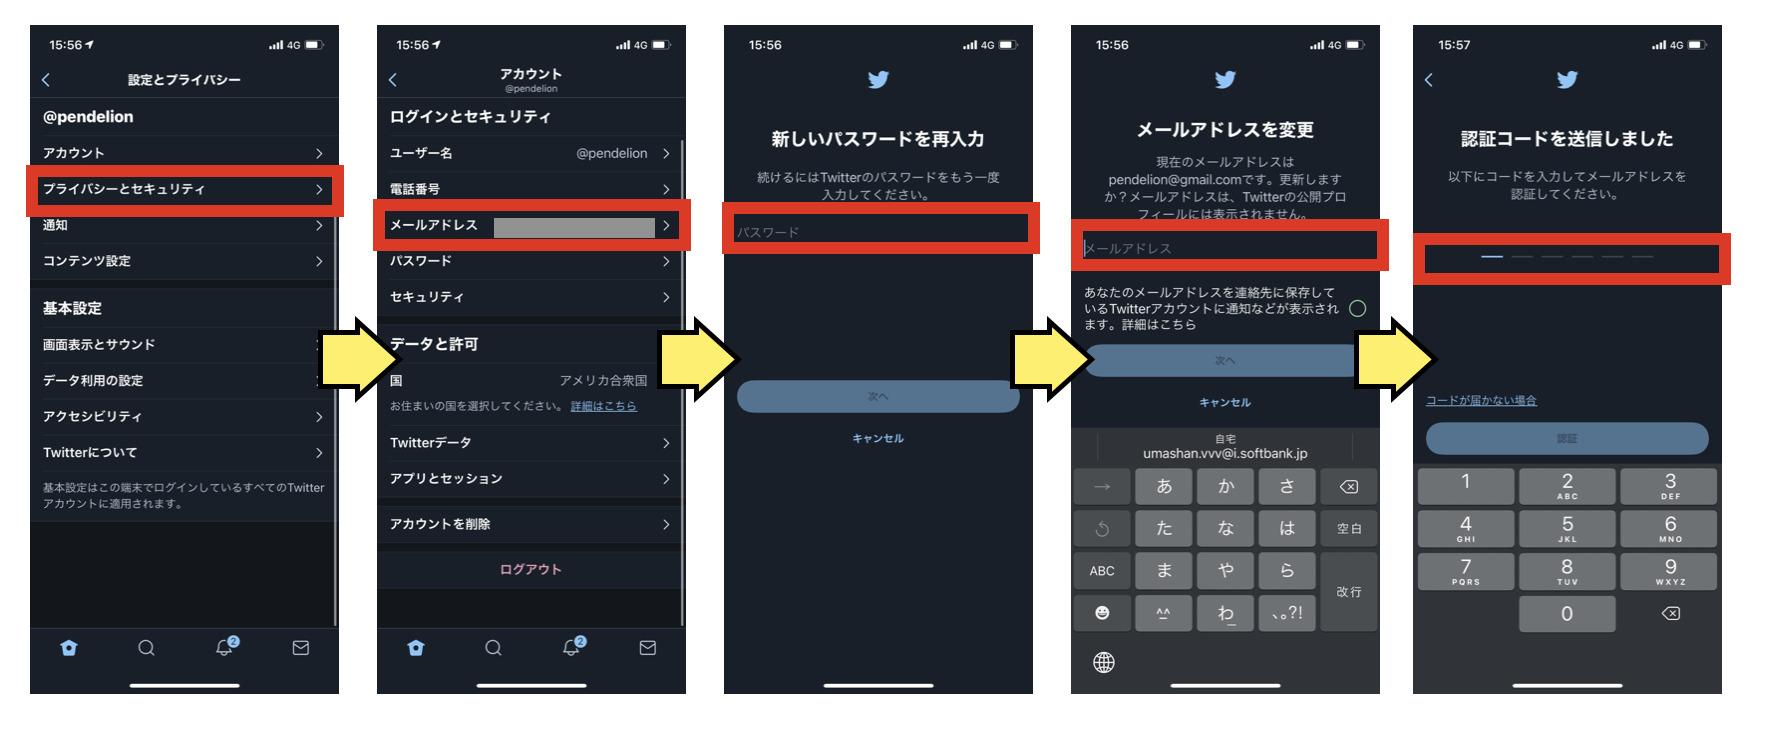 Twitterのメールアドレスを変更する方法(アプリの場合)